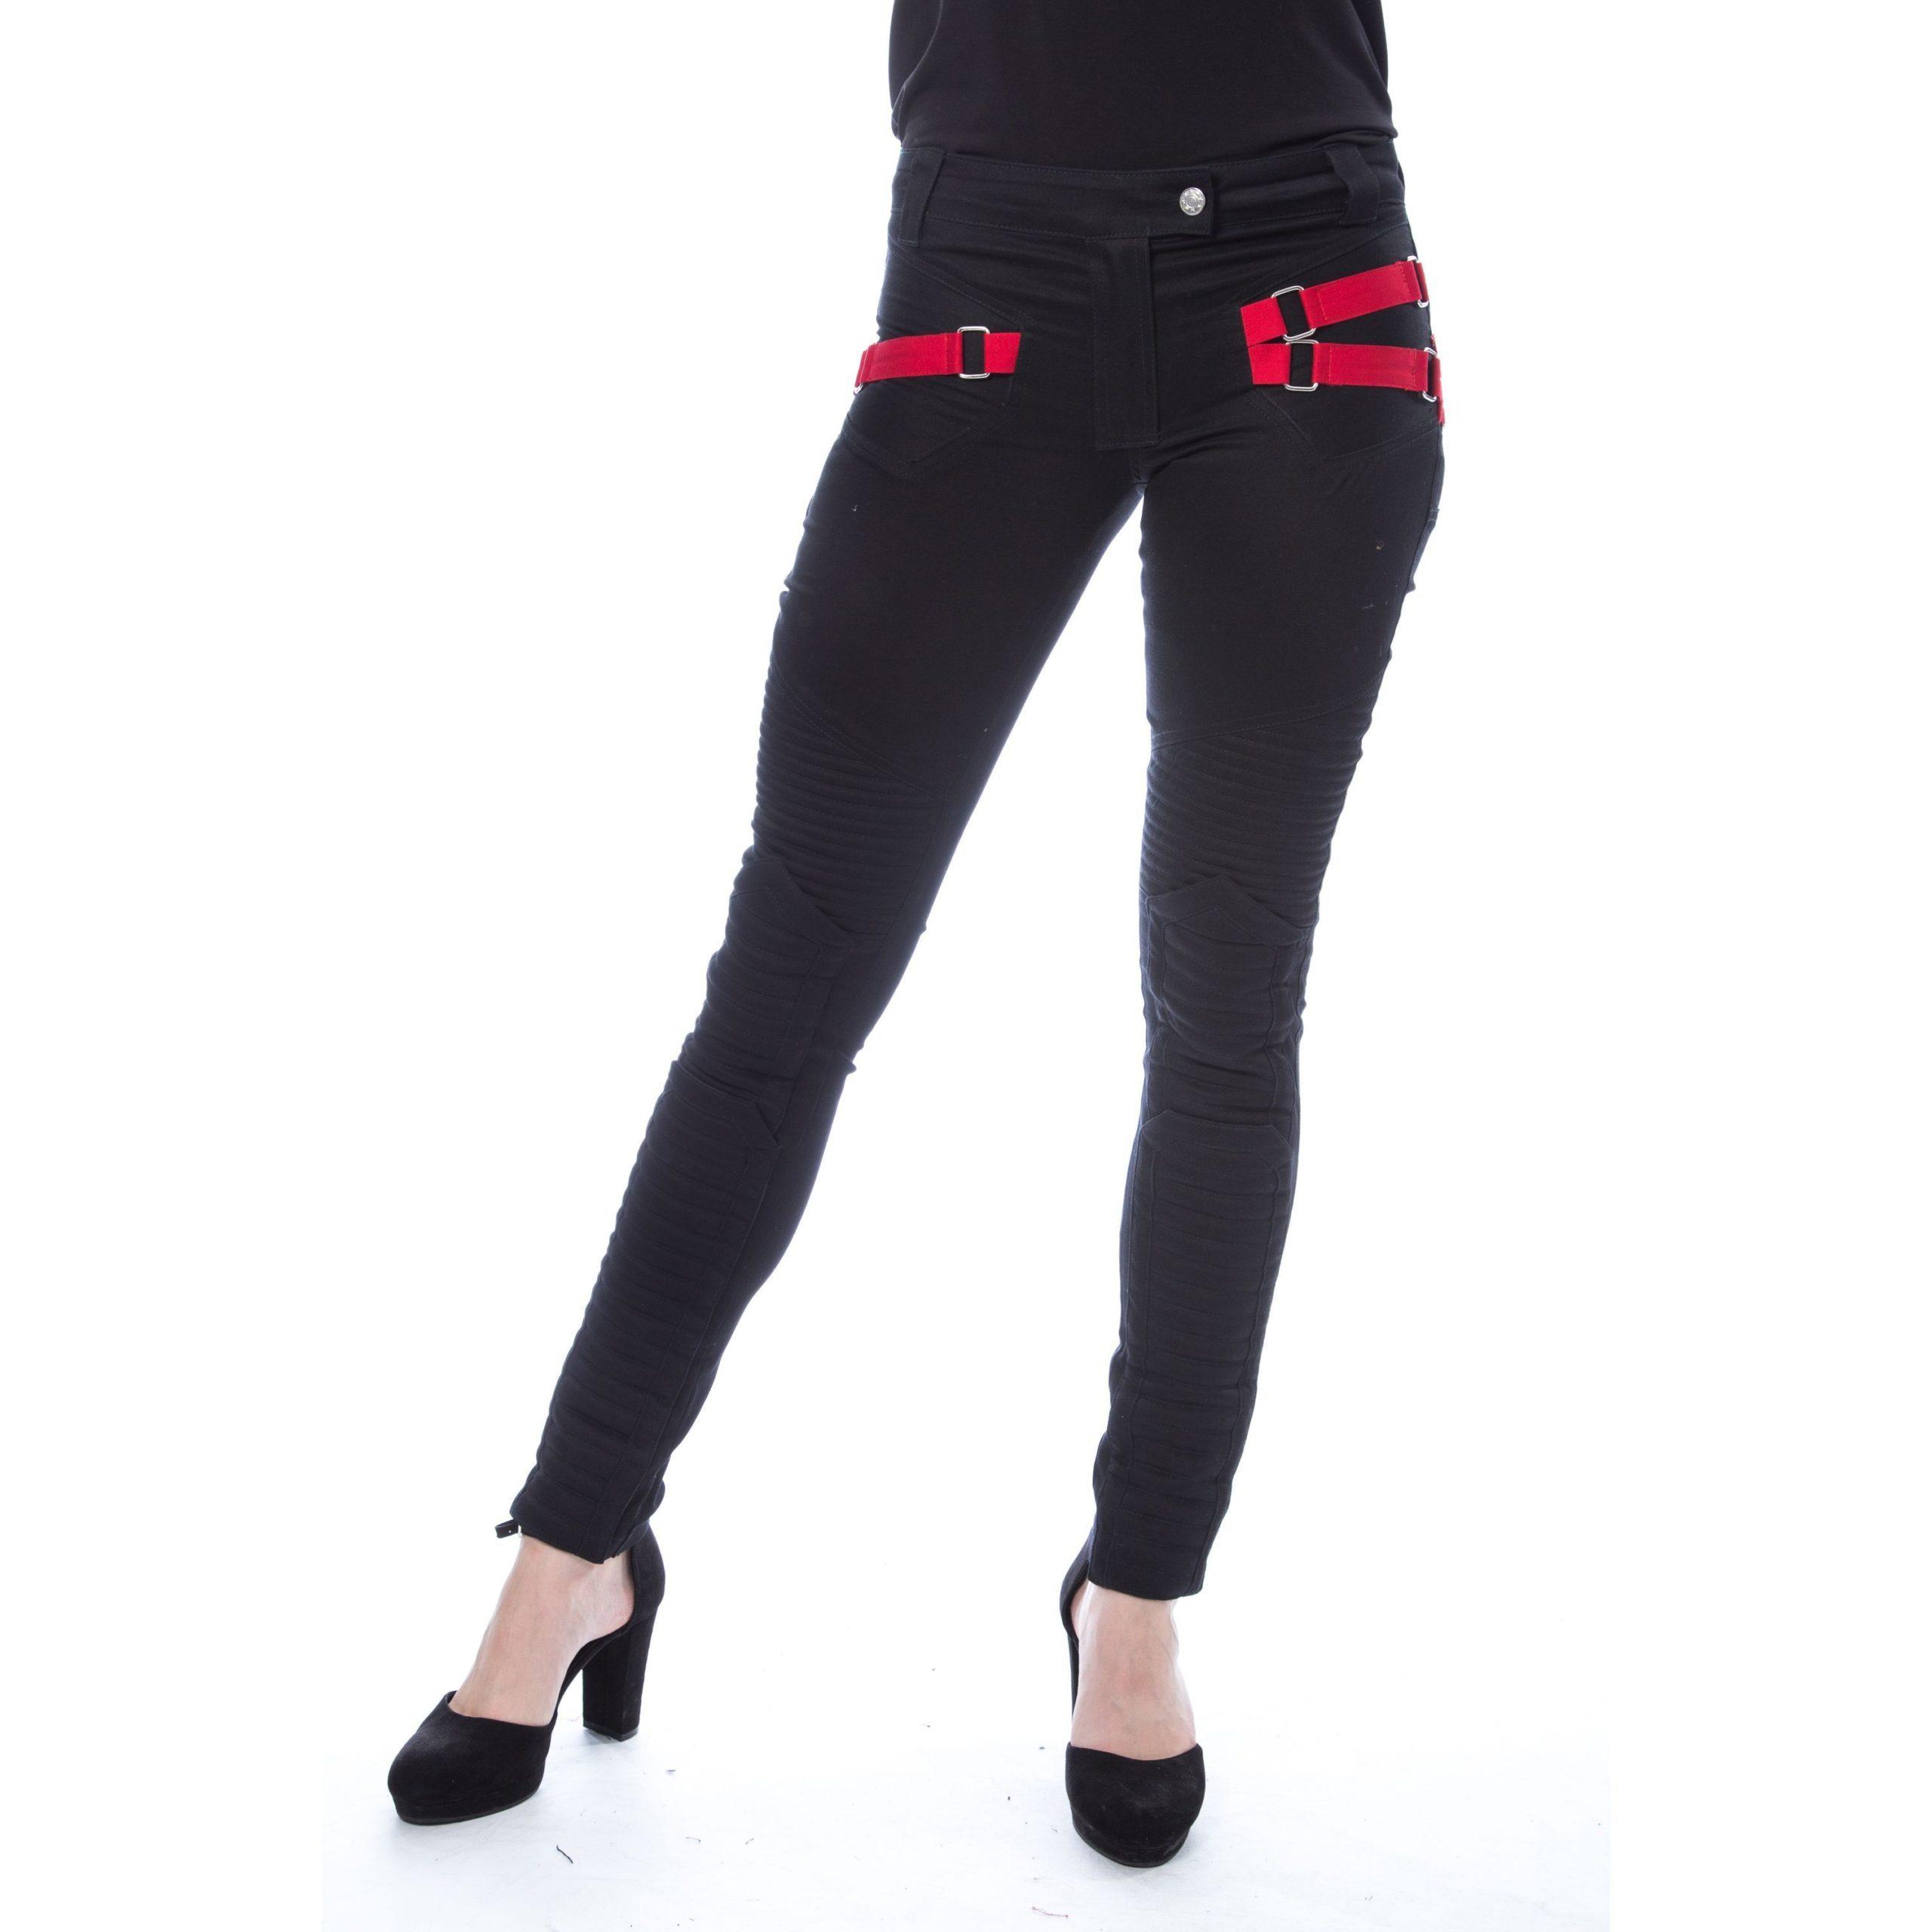 nano-pants-black-red-chemical-black-1